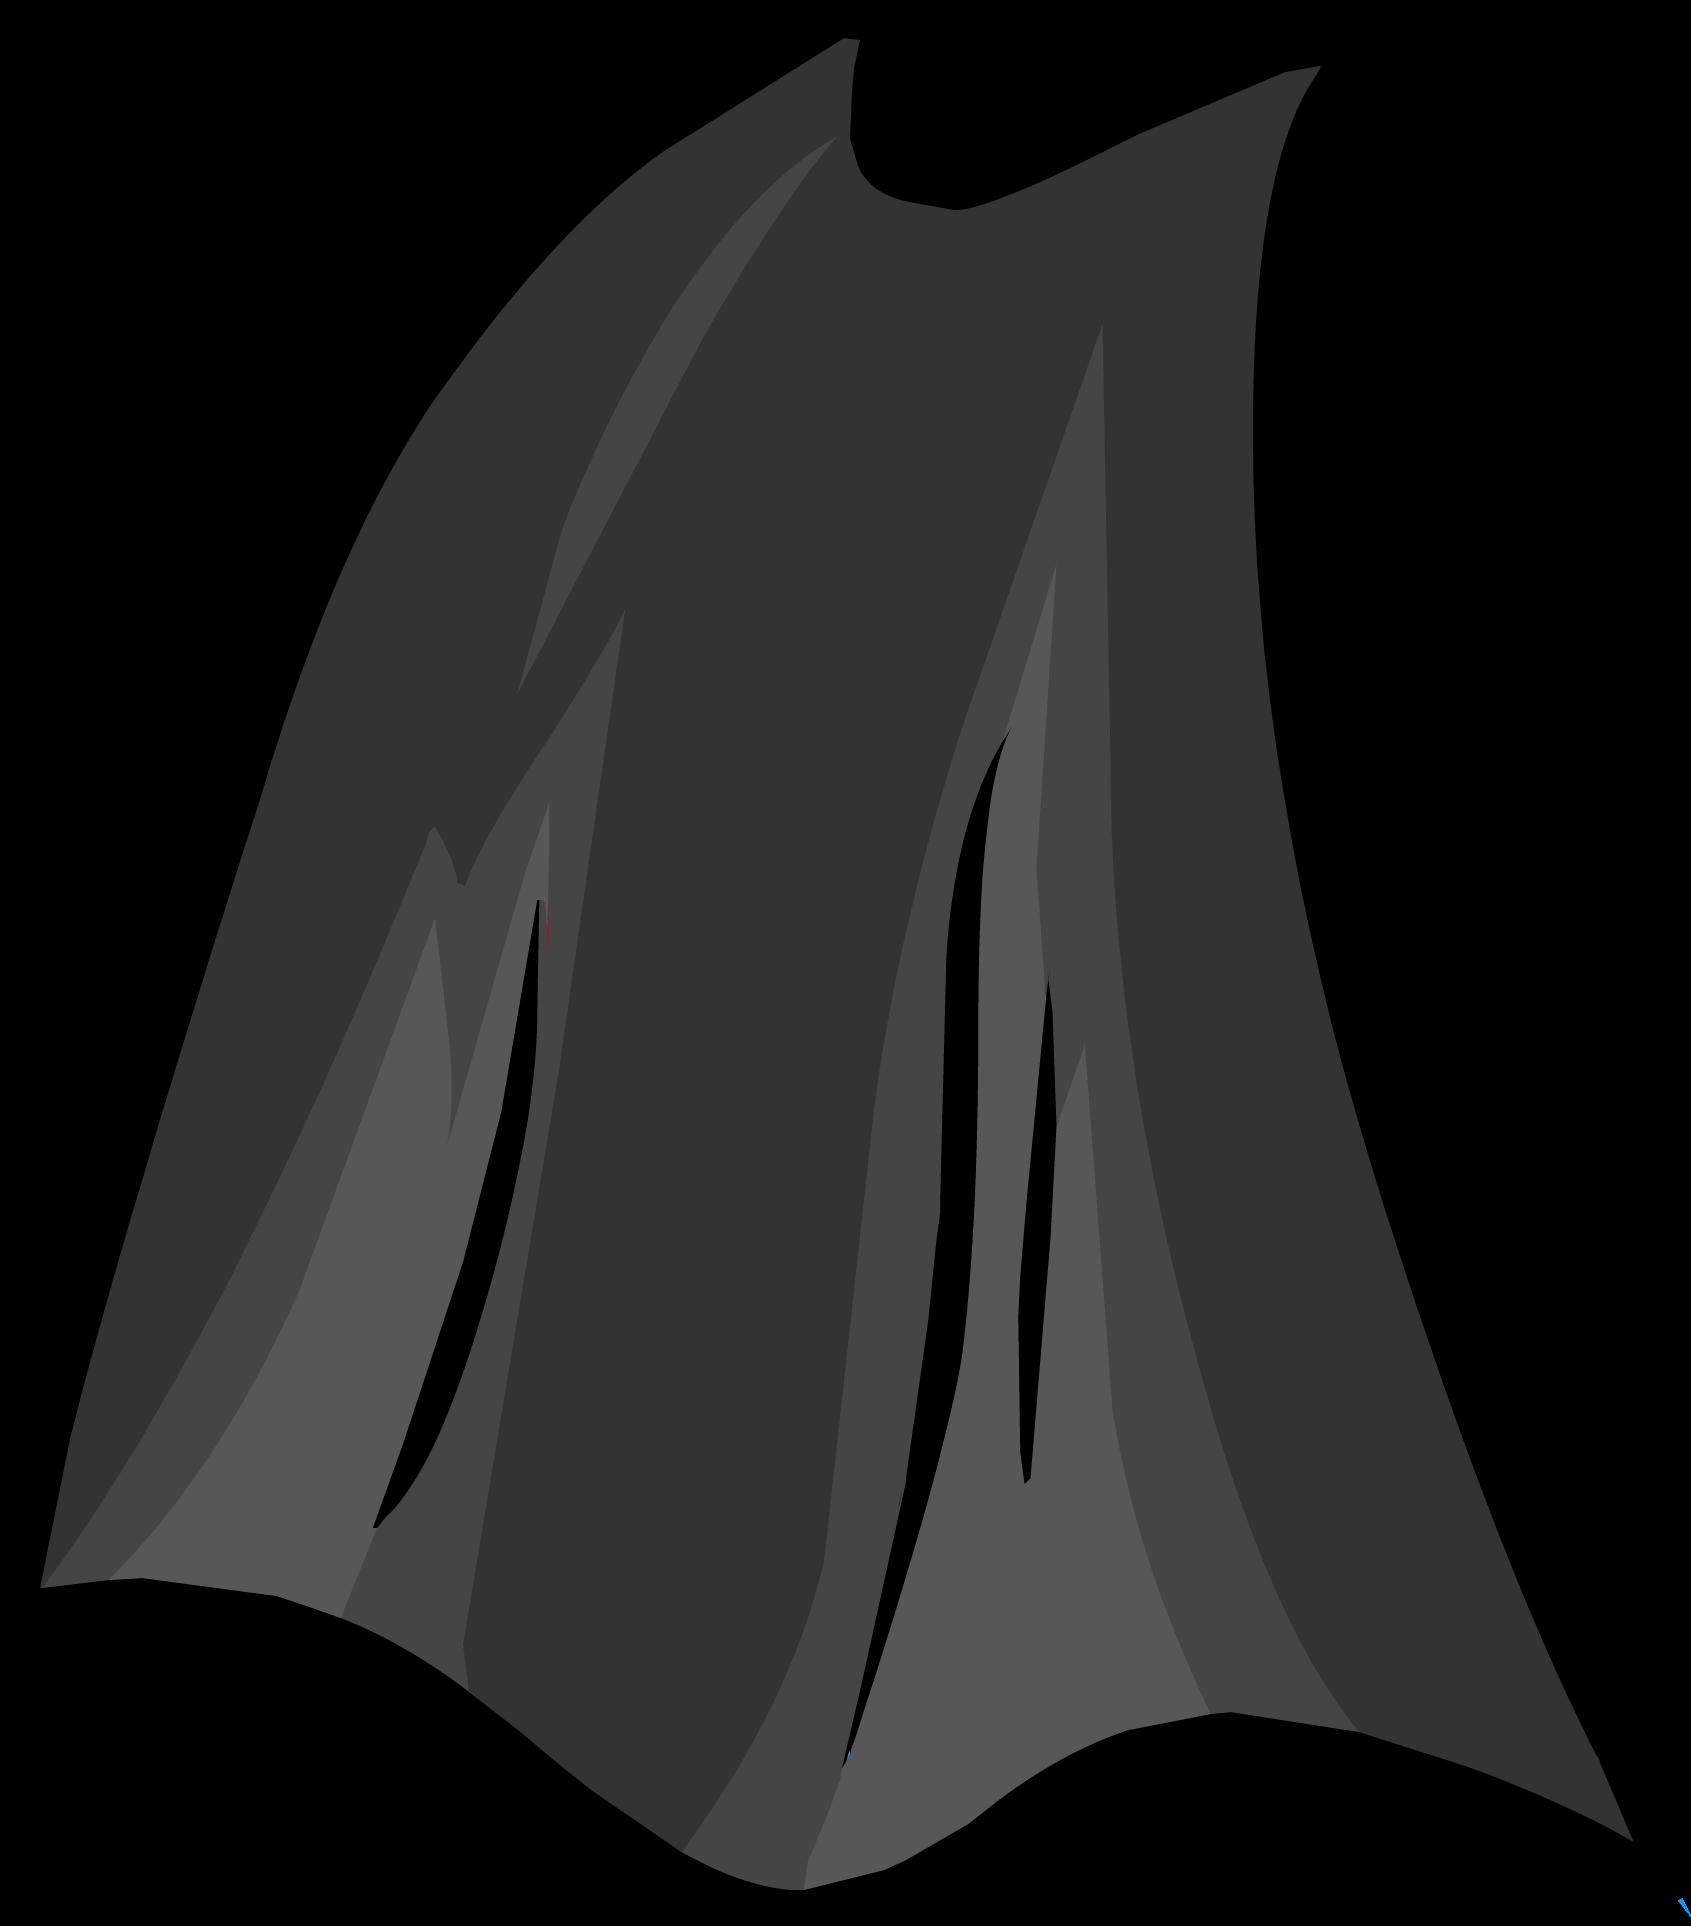 Magician clipart cape. Black club penguin rewritten